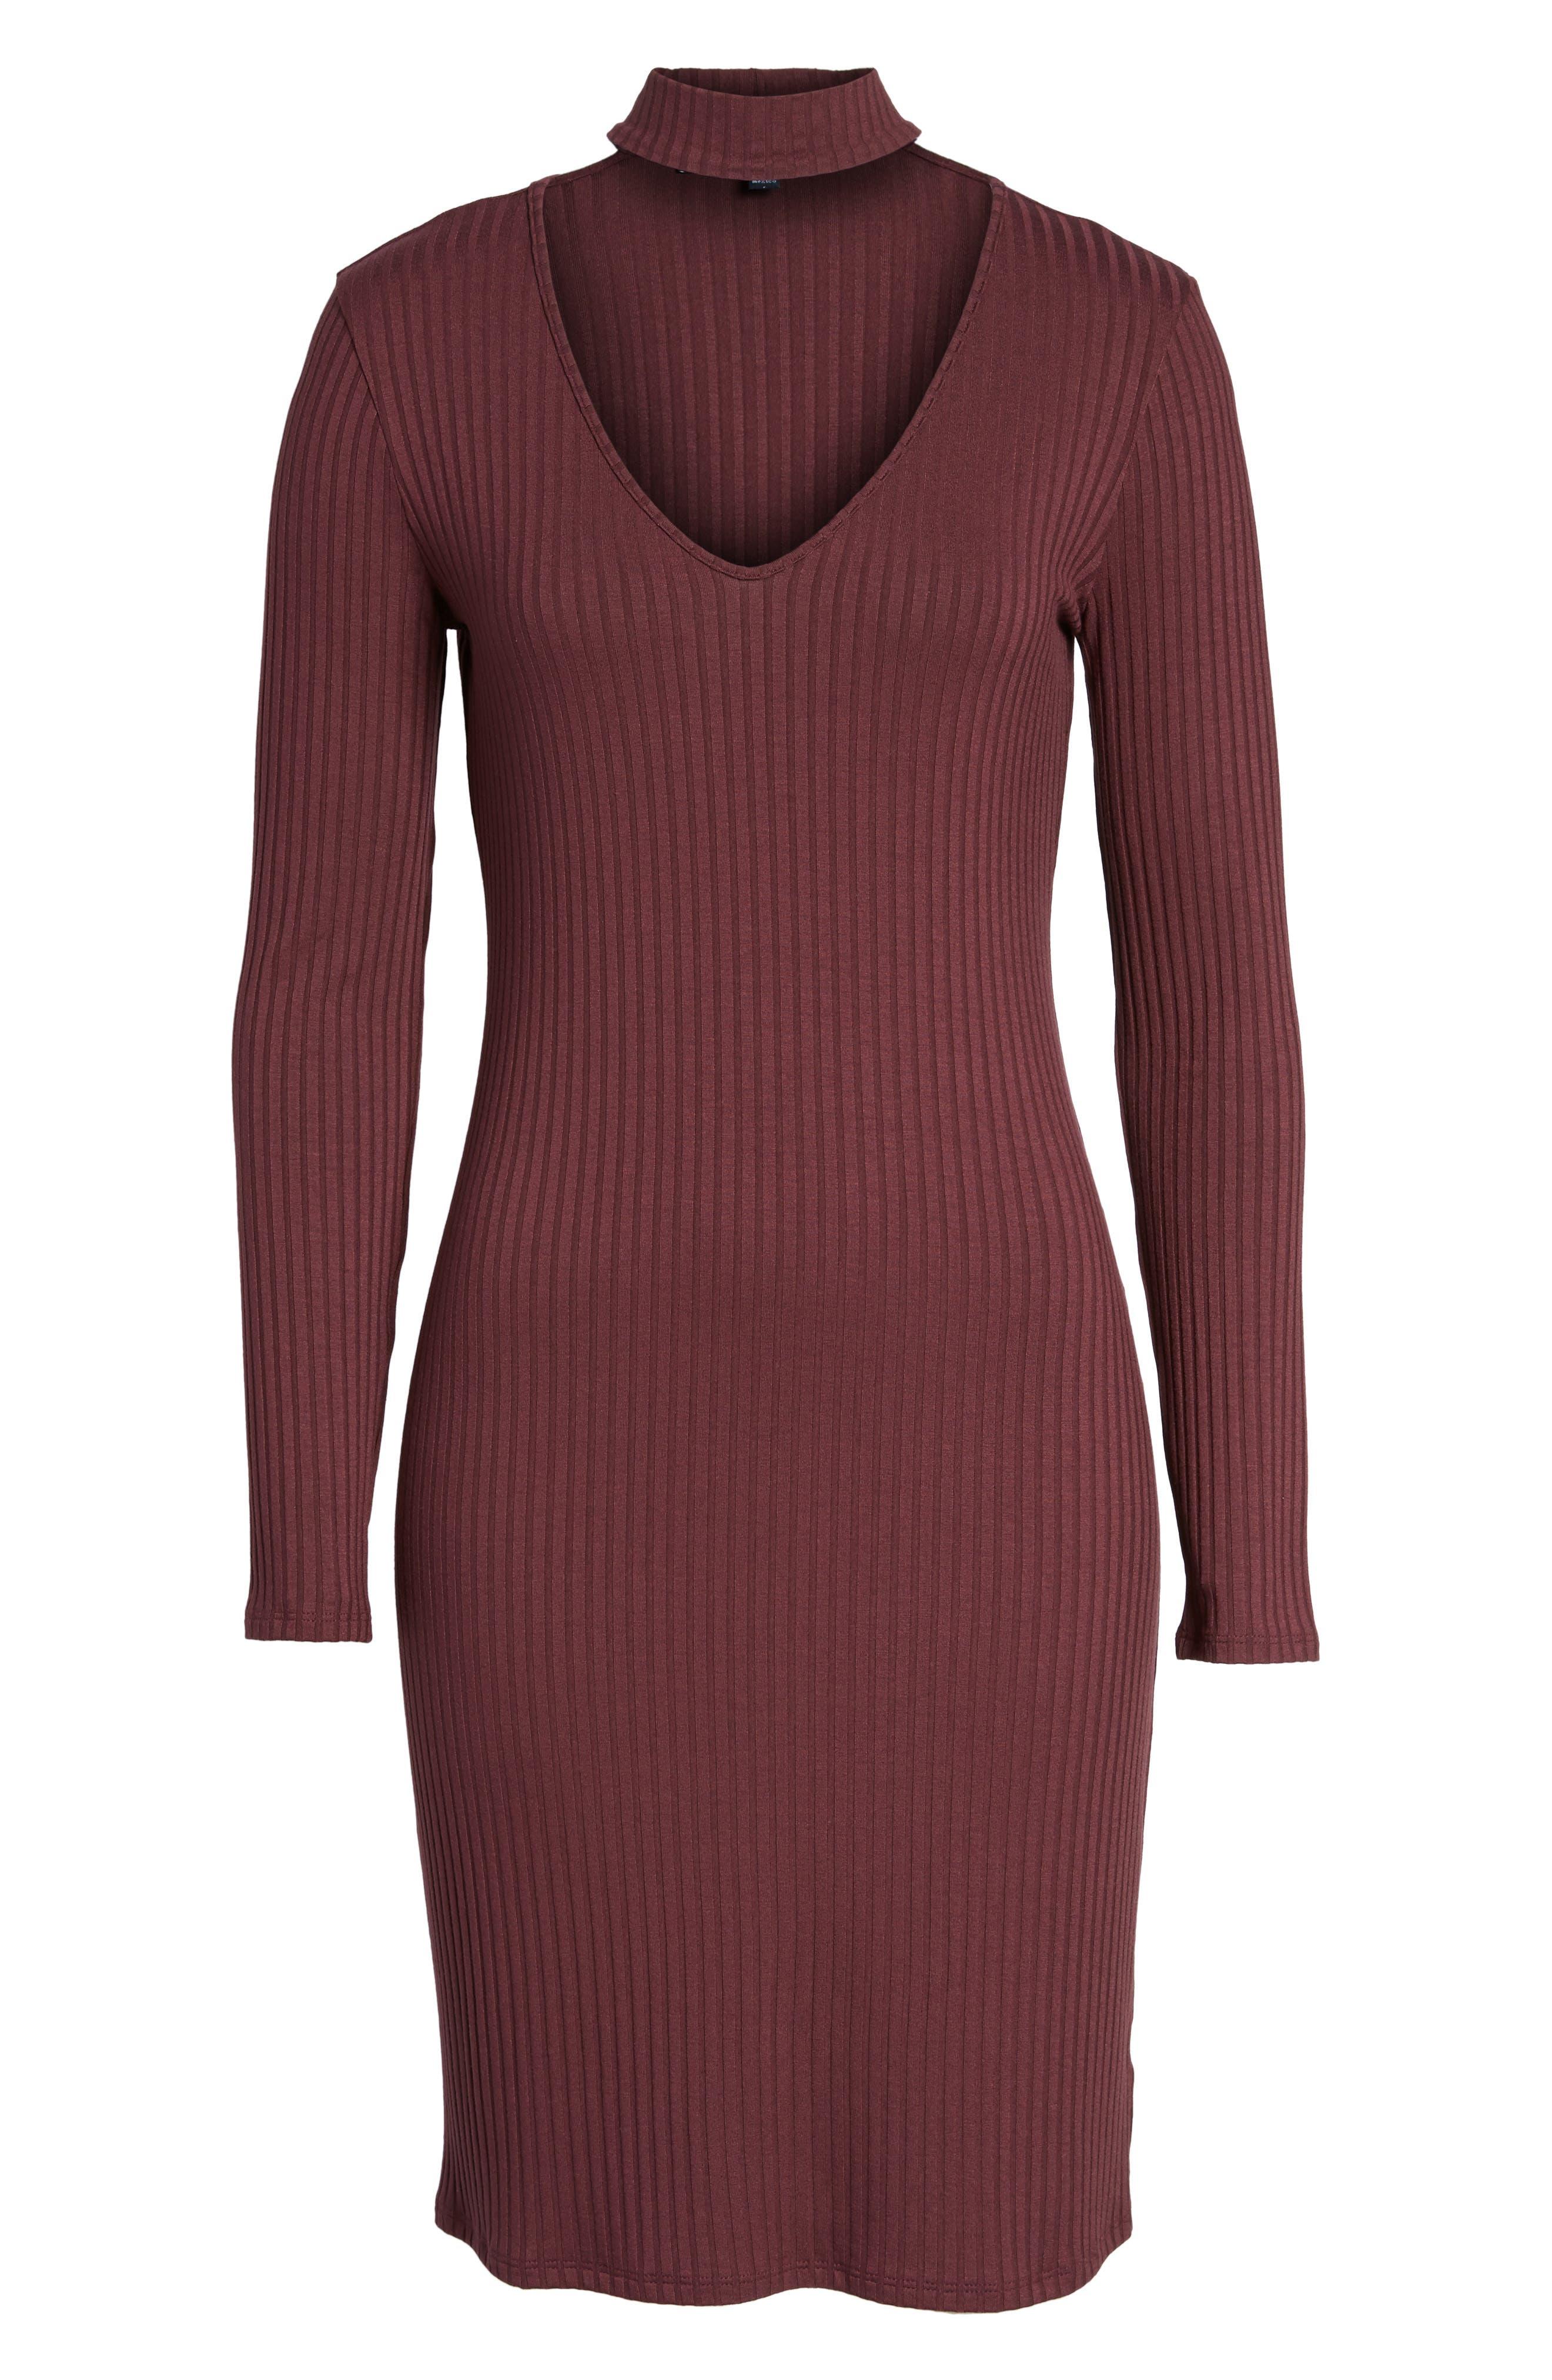 Ribbed Choker Dress,                             Alternate thumbnail 6, color,                             Red Tannin